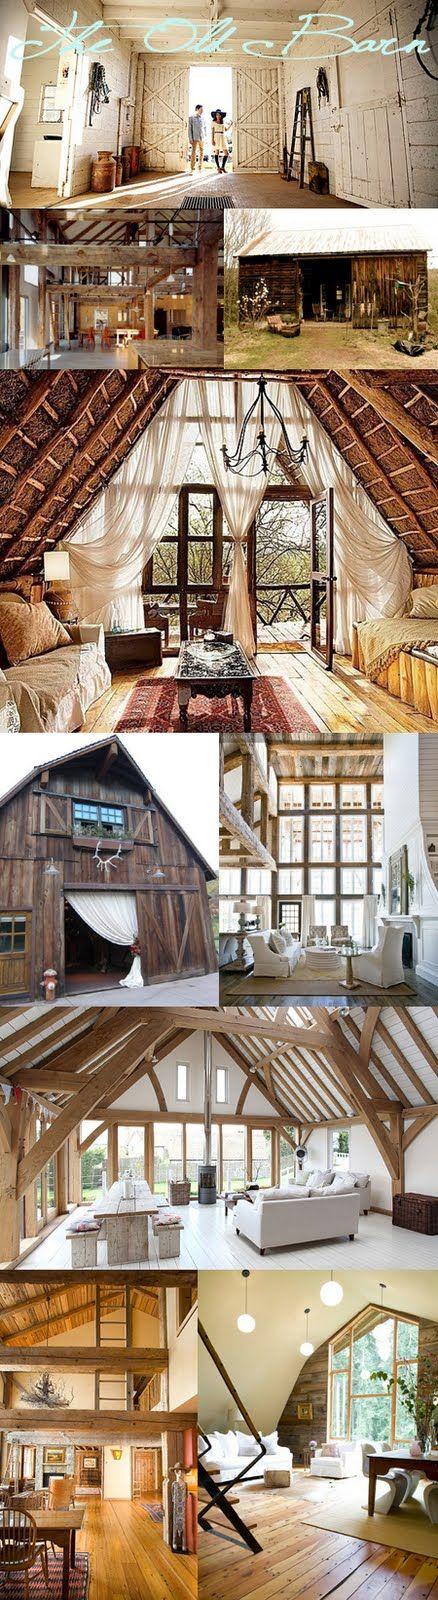 Barn house                                                                                                                                                                                 More